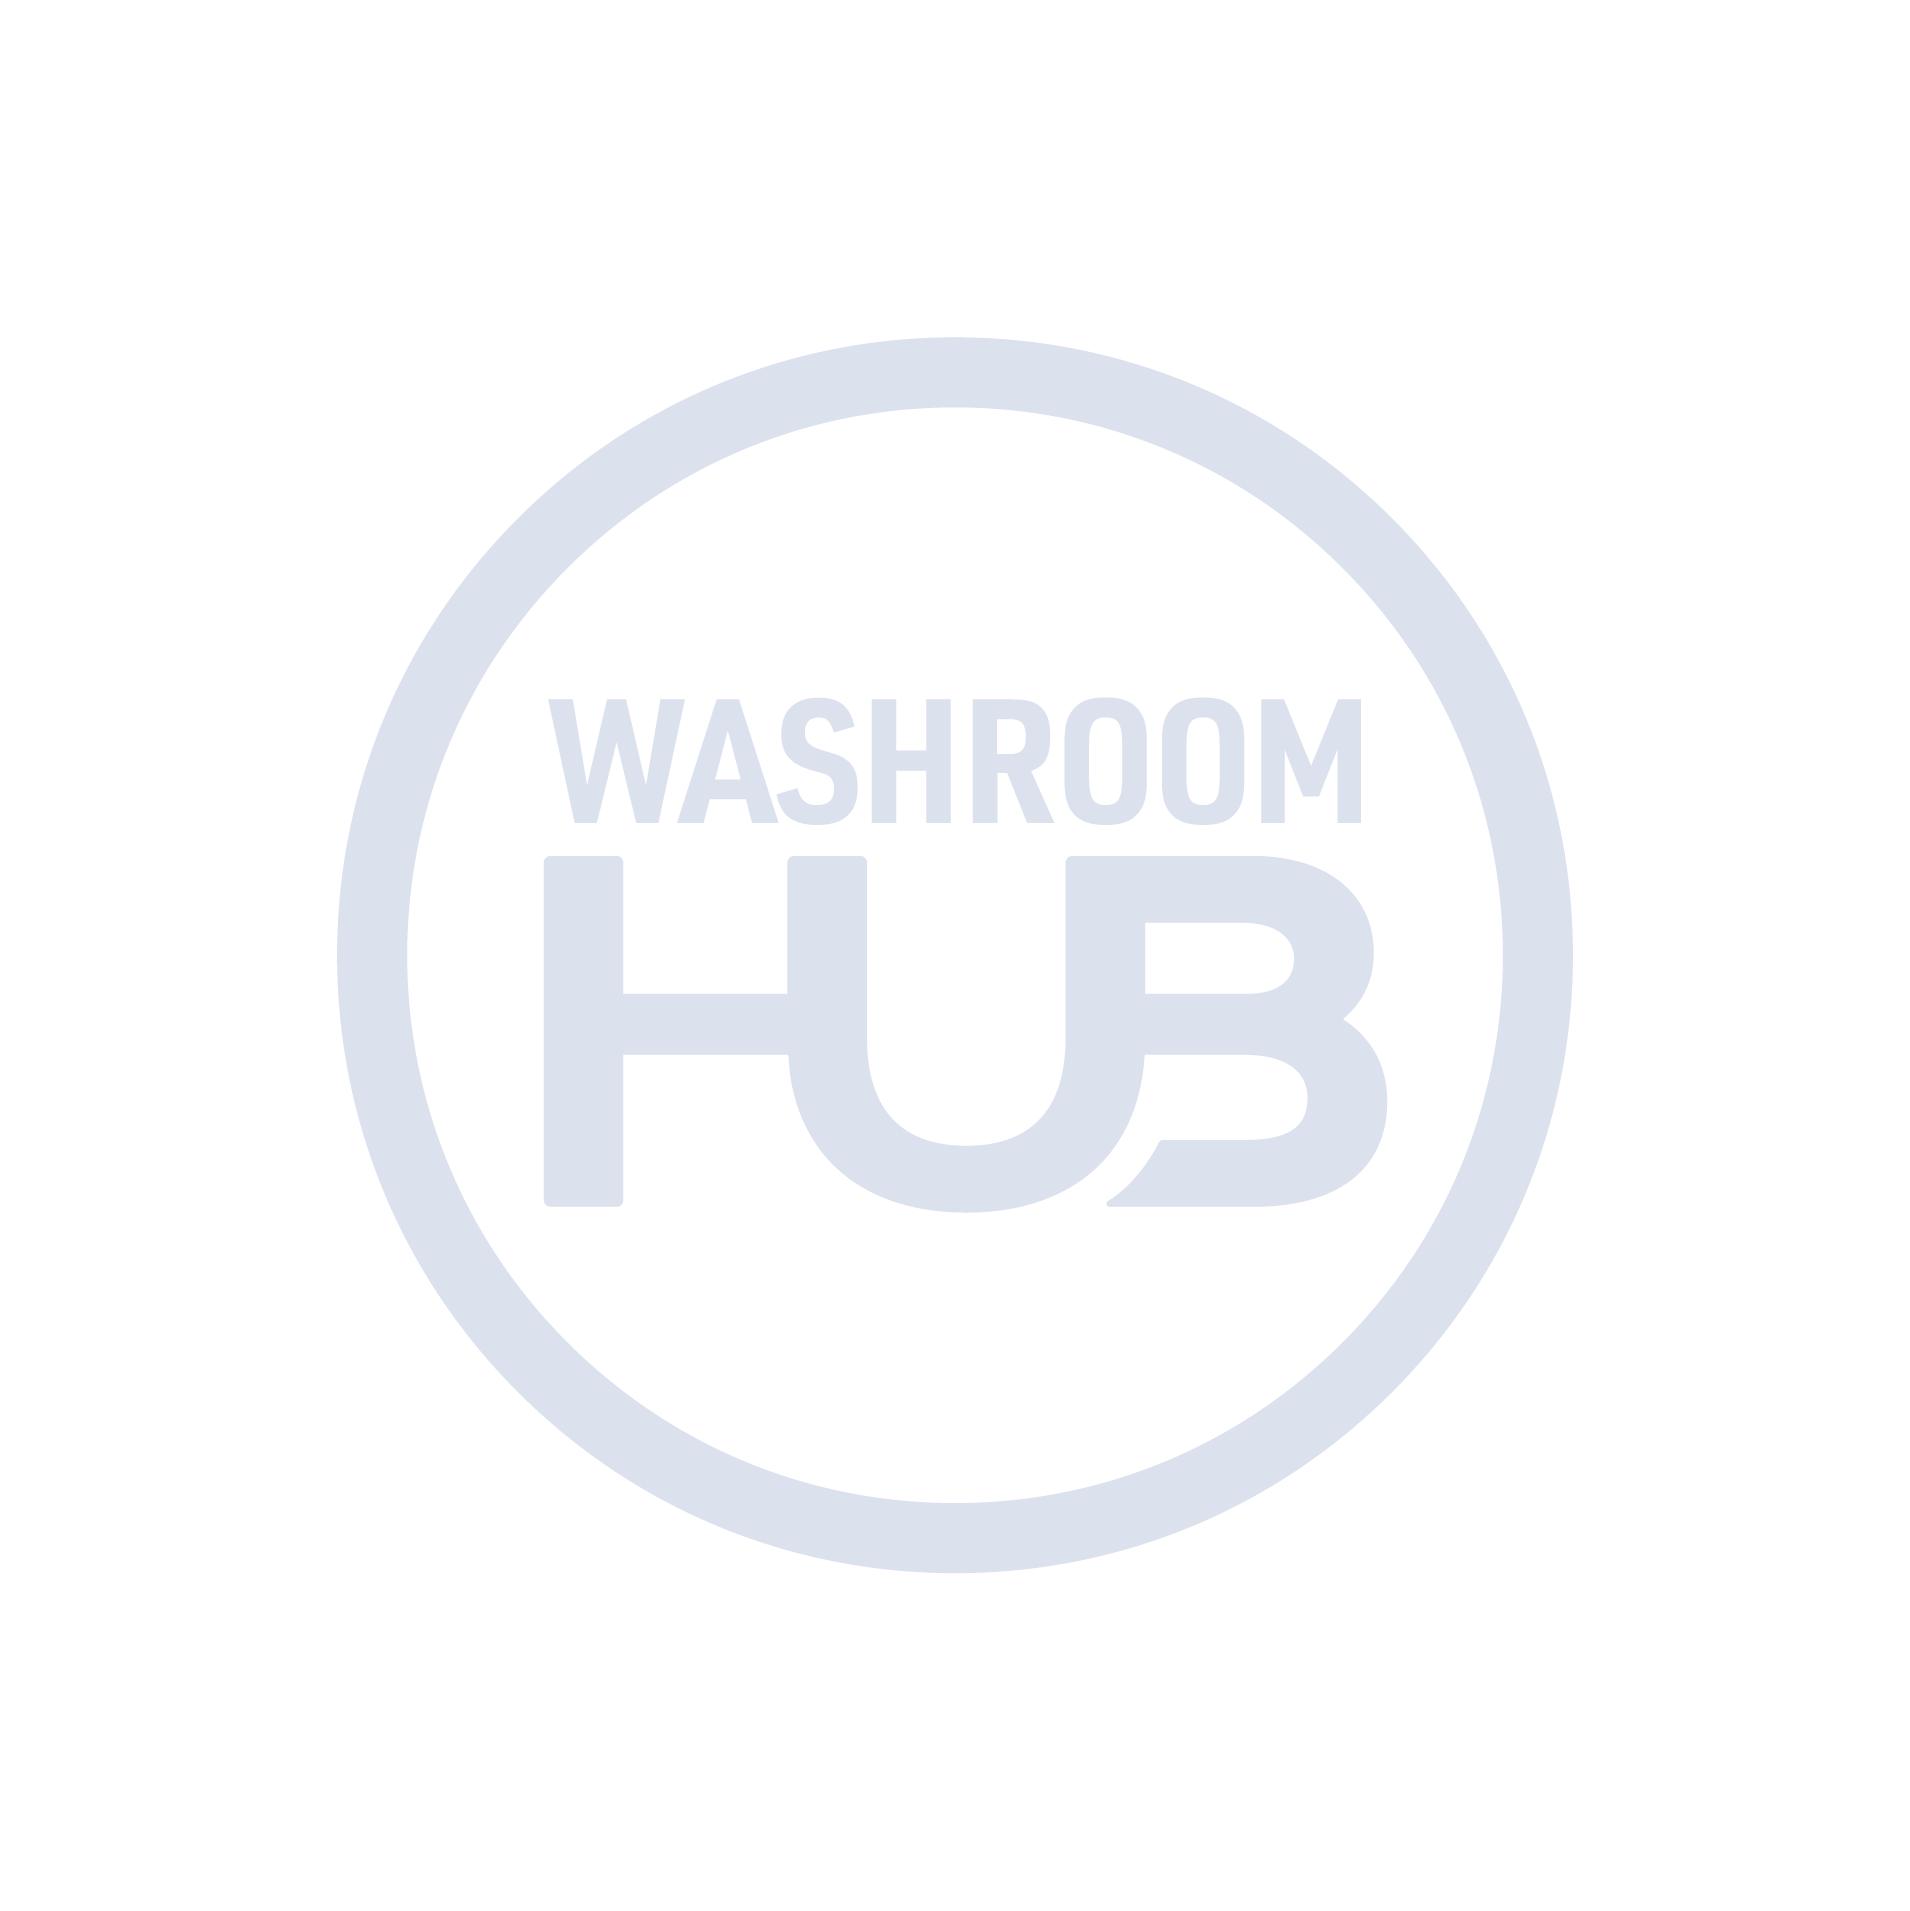 Centre Feed Hand Towel Dispenser - Image1